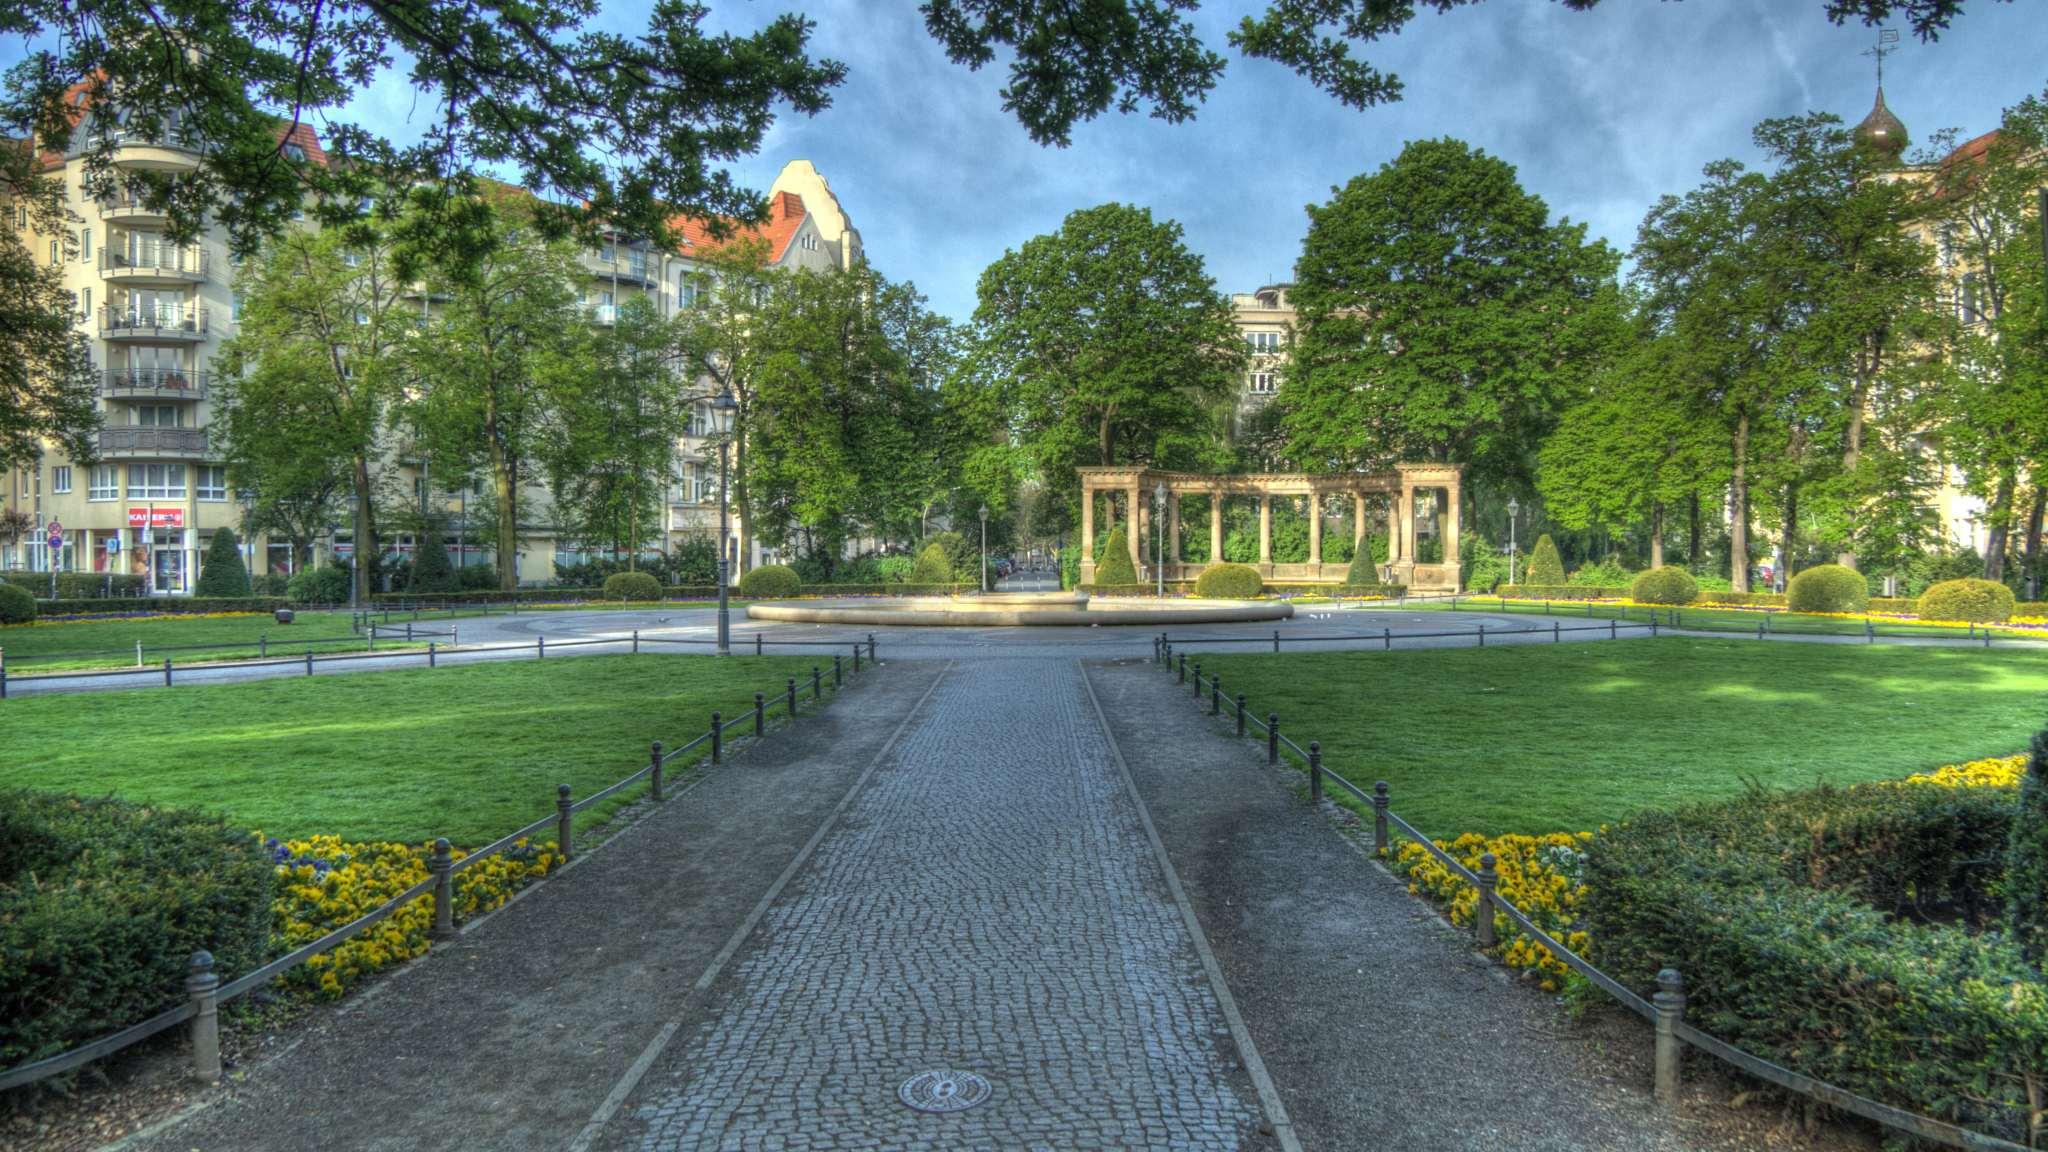 Viktoria Luis Platz